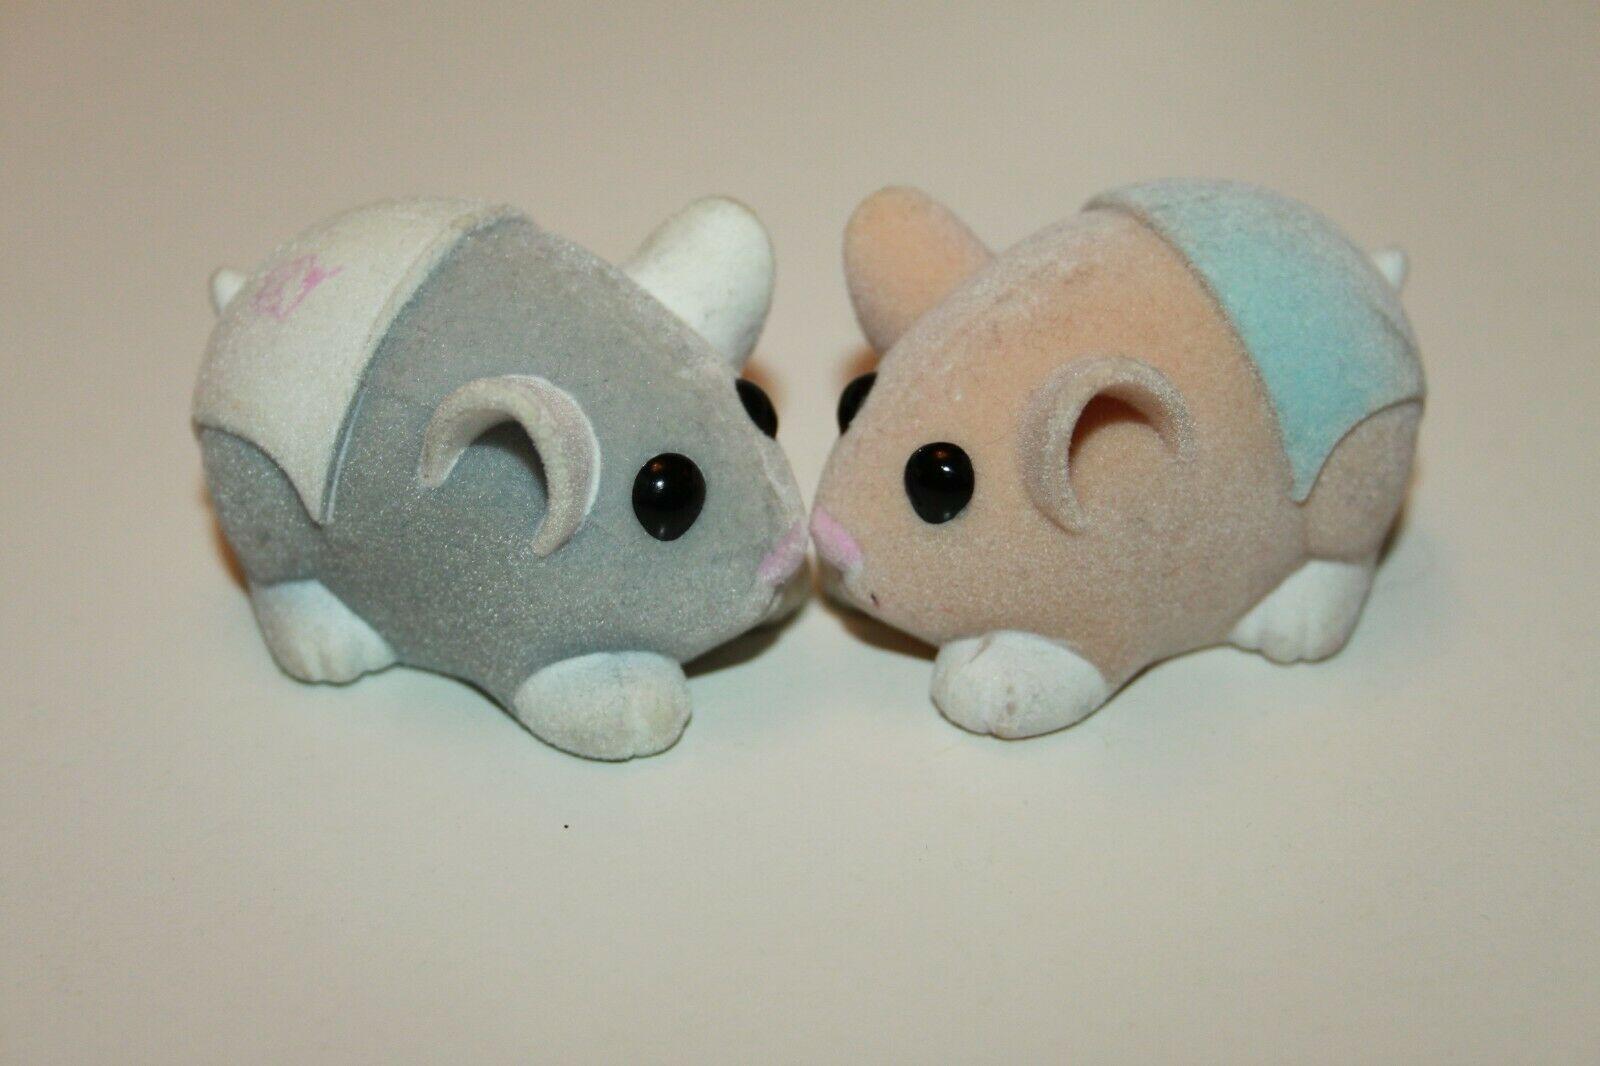 2 X Zhu Zhu Pets Hamster Babies Grey White Diaper Baby Cakes Orange Blue Peanut Ebay Baby Diapers Hamster Diaper